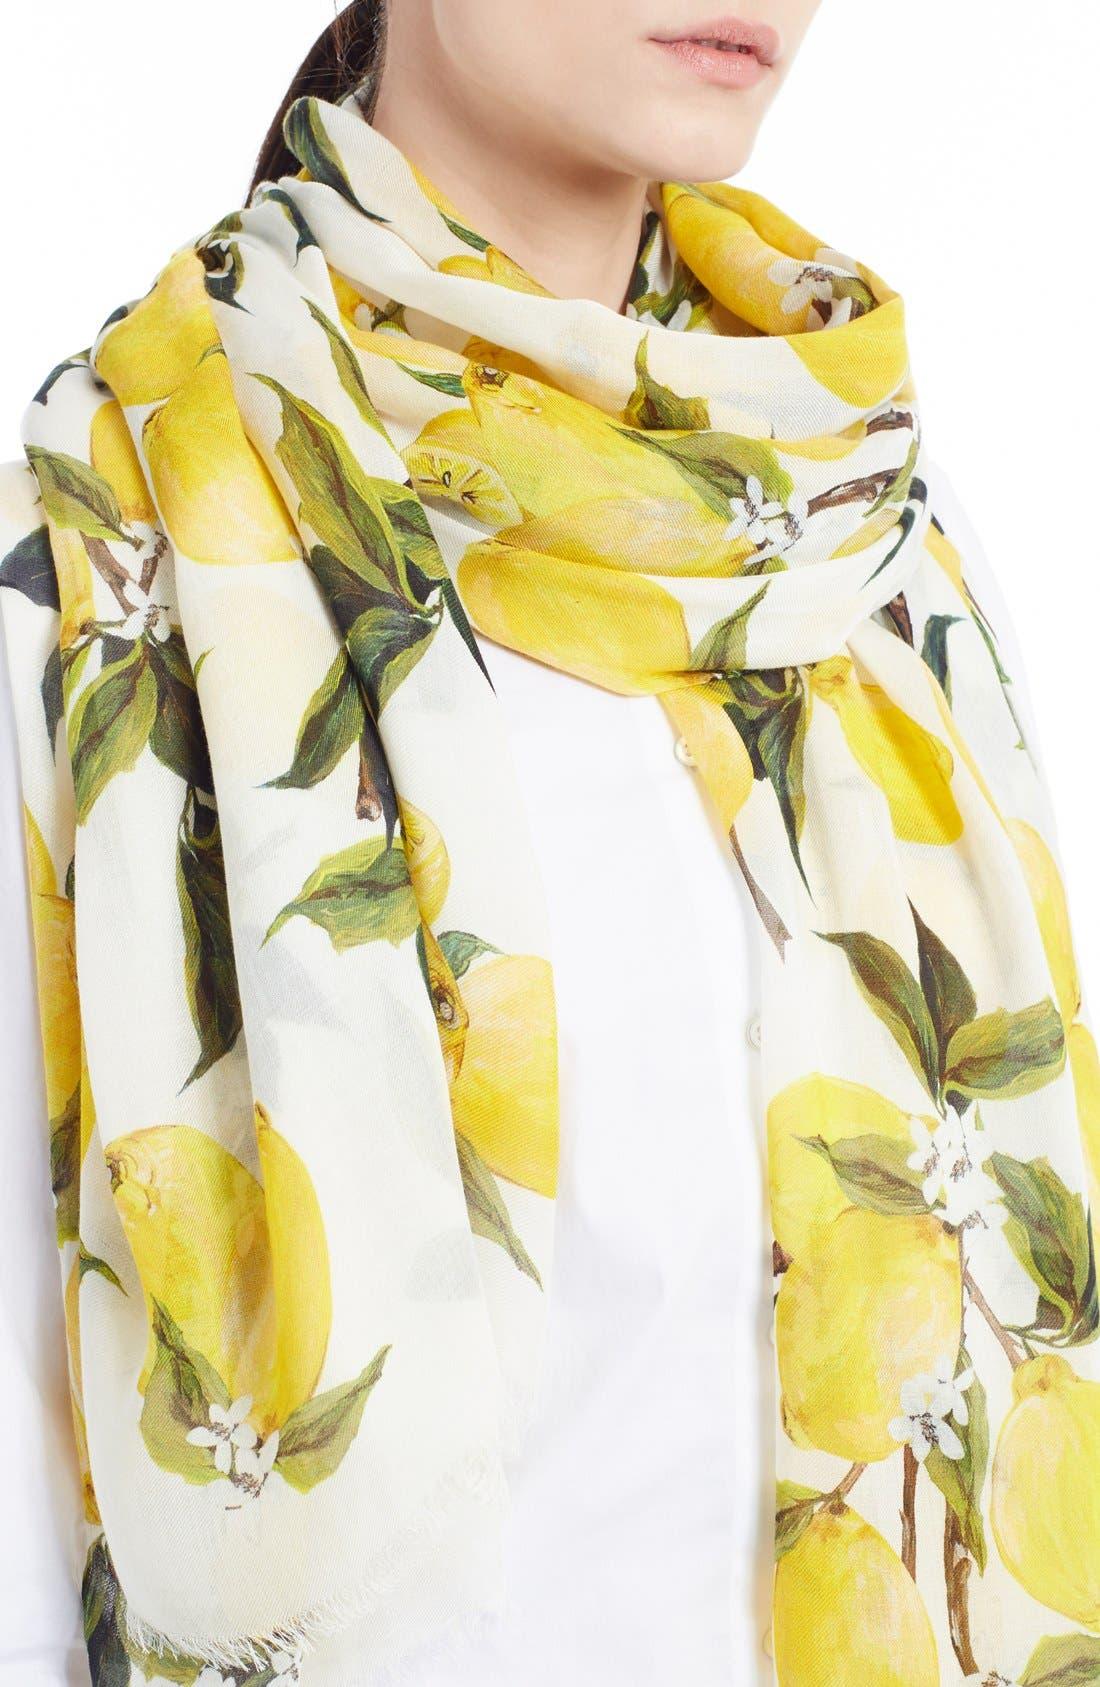 Alternate Image 1 Selected - Dolce&Gabbana Lemon Print Modal & Cashmere Scarf